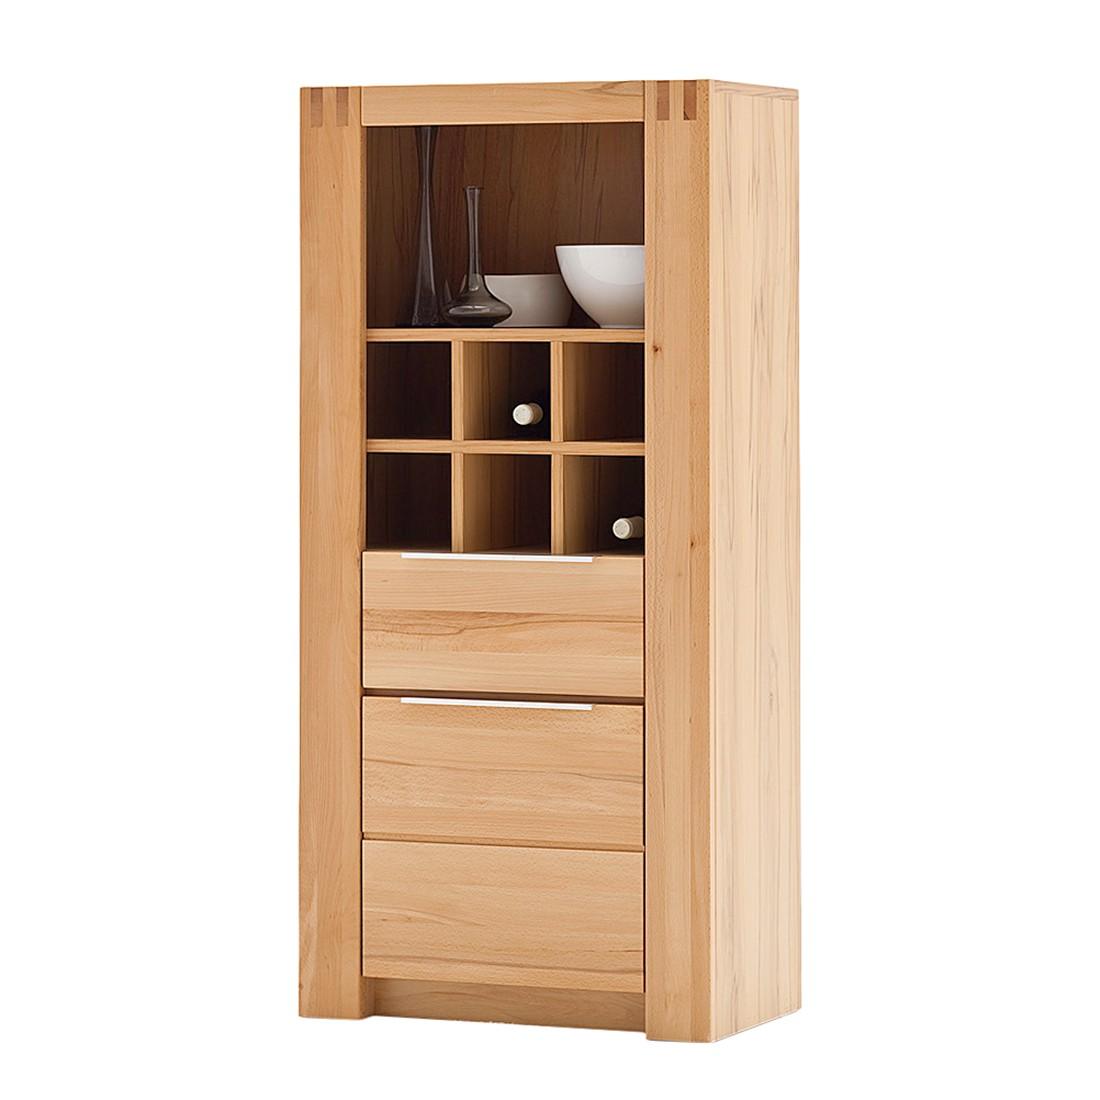 highboards online kaufen m bel suchmaschine. Black Bedroom Furniture Sets. Home Design Ideas